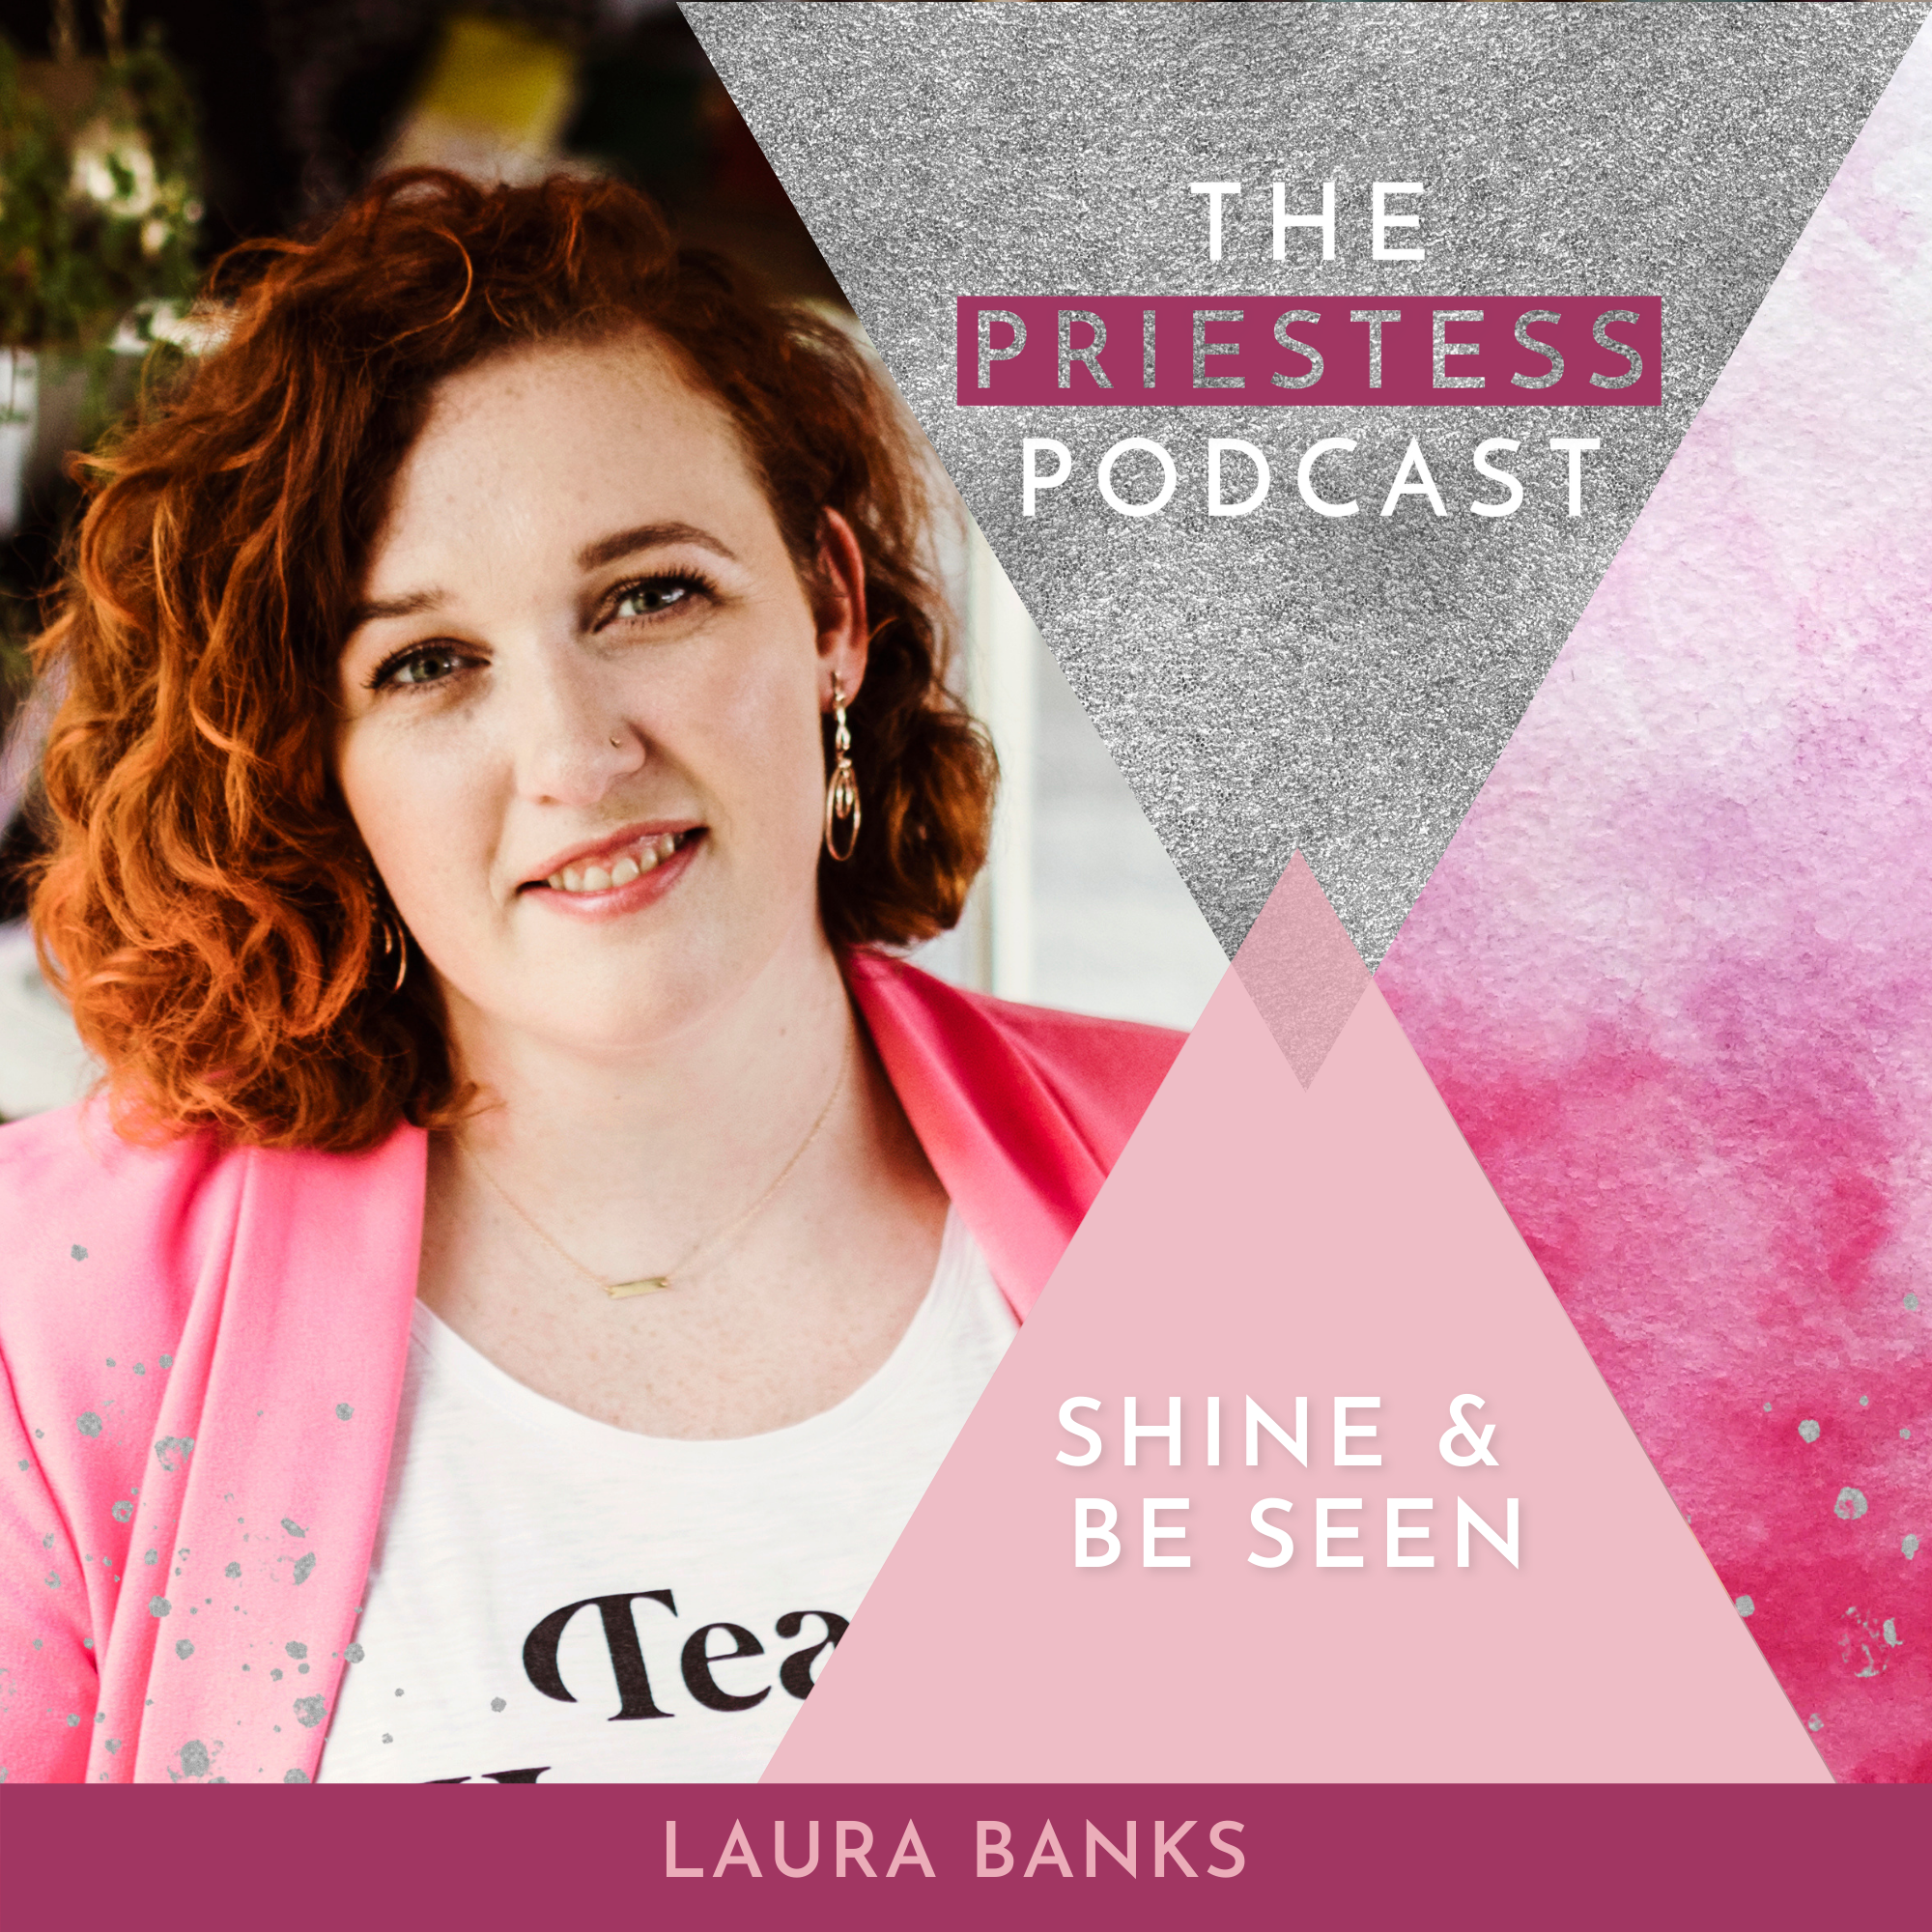 Laura Banks on Shine & Be Seen